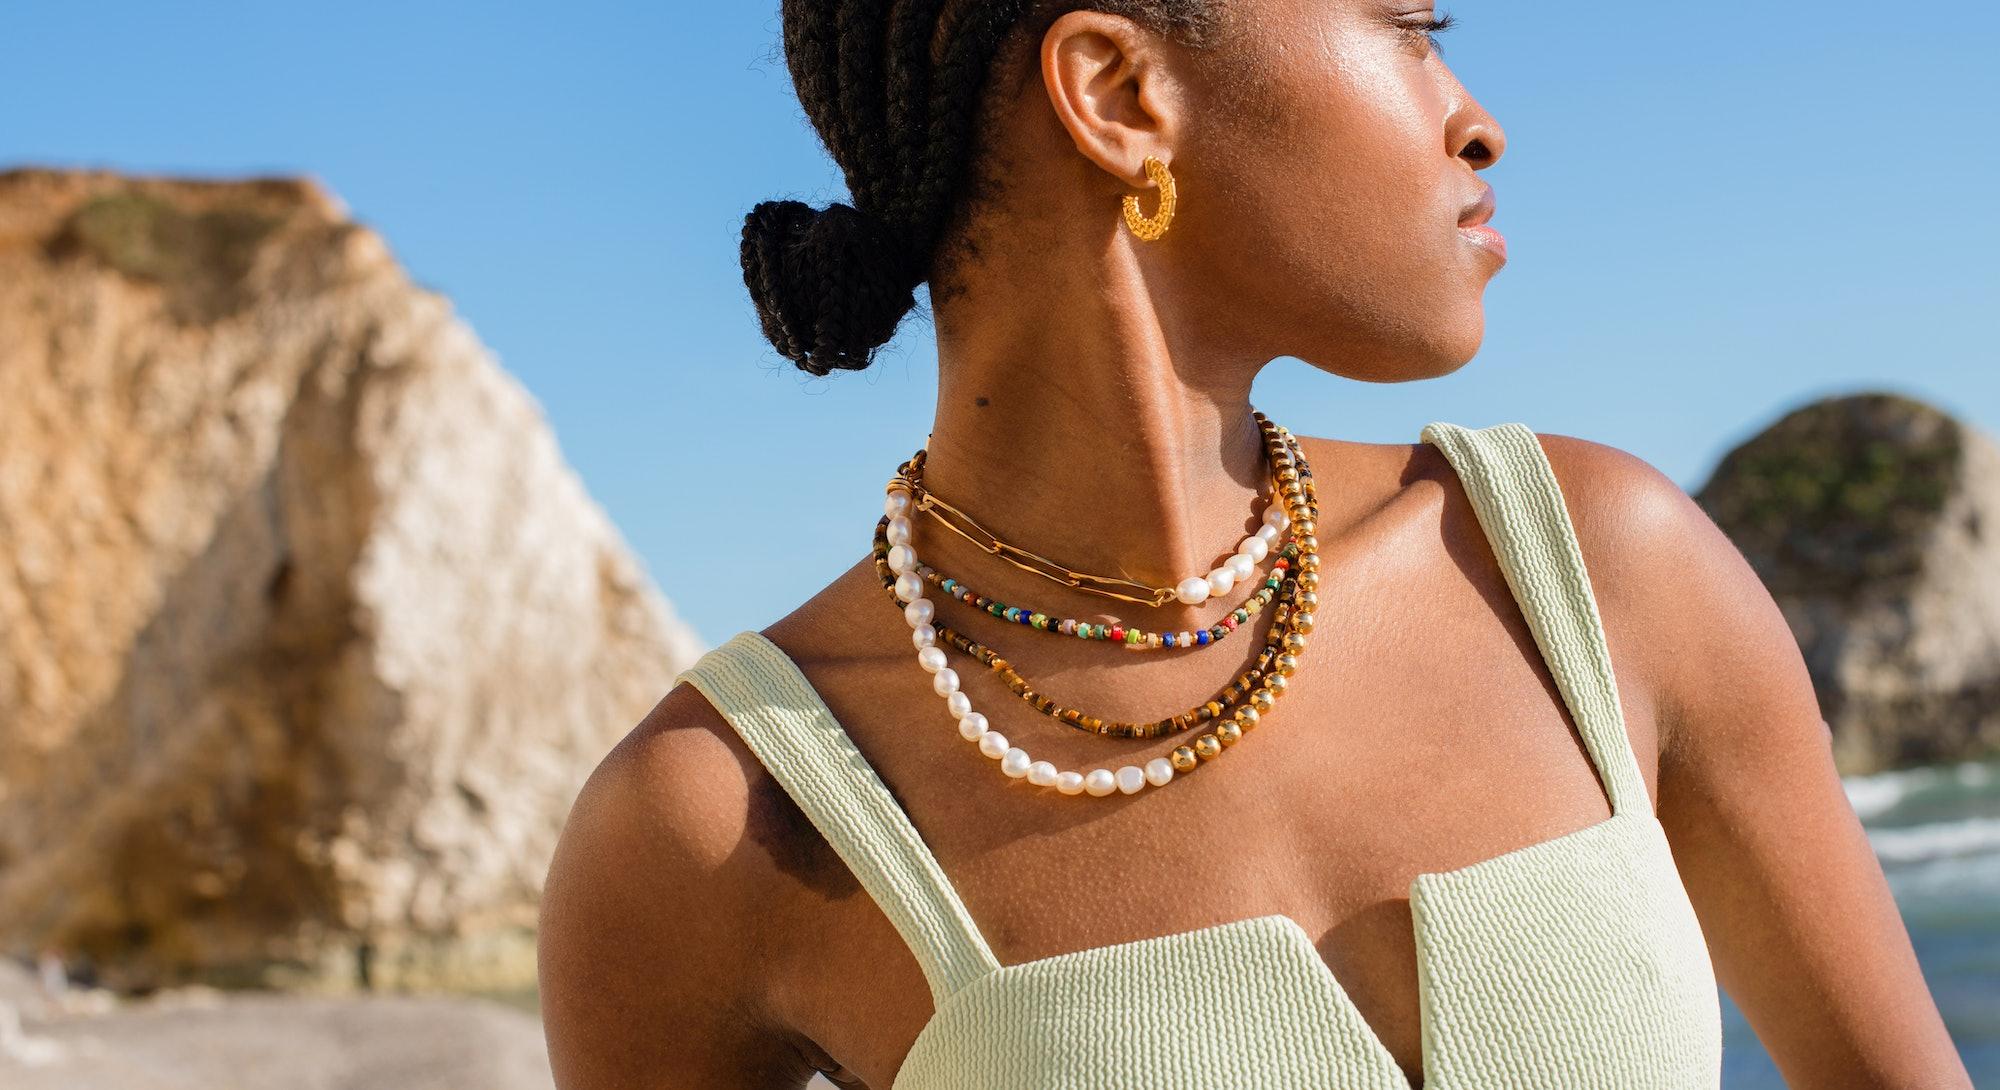 Model wearing Missoma beaded necklace.